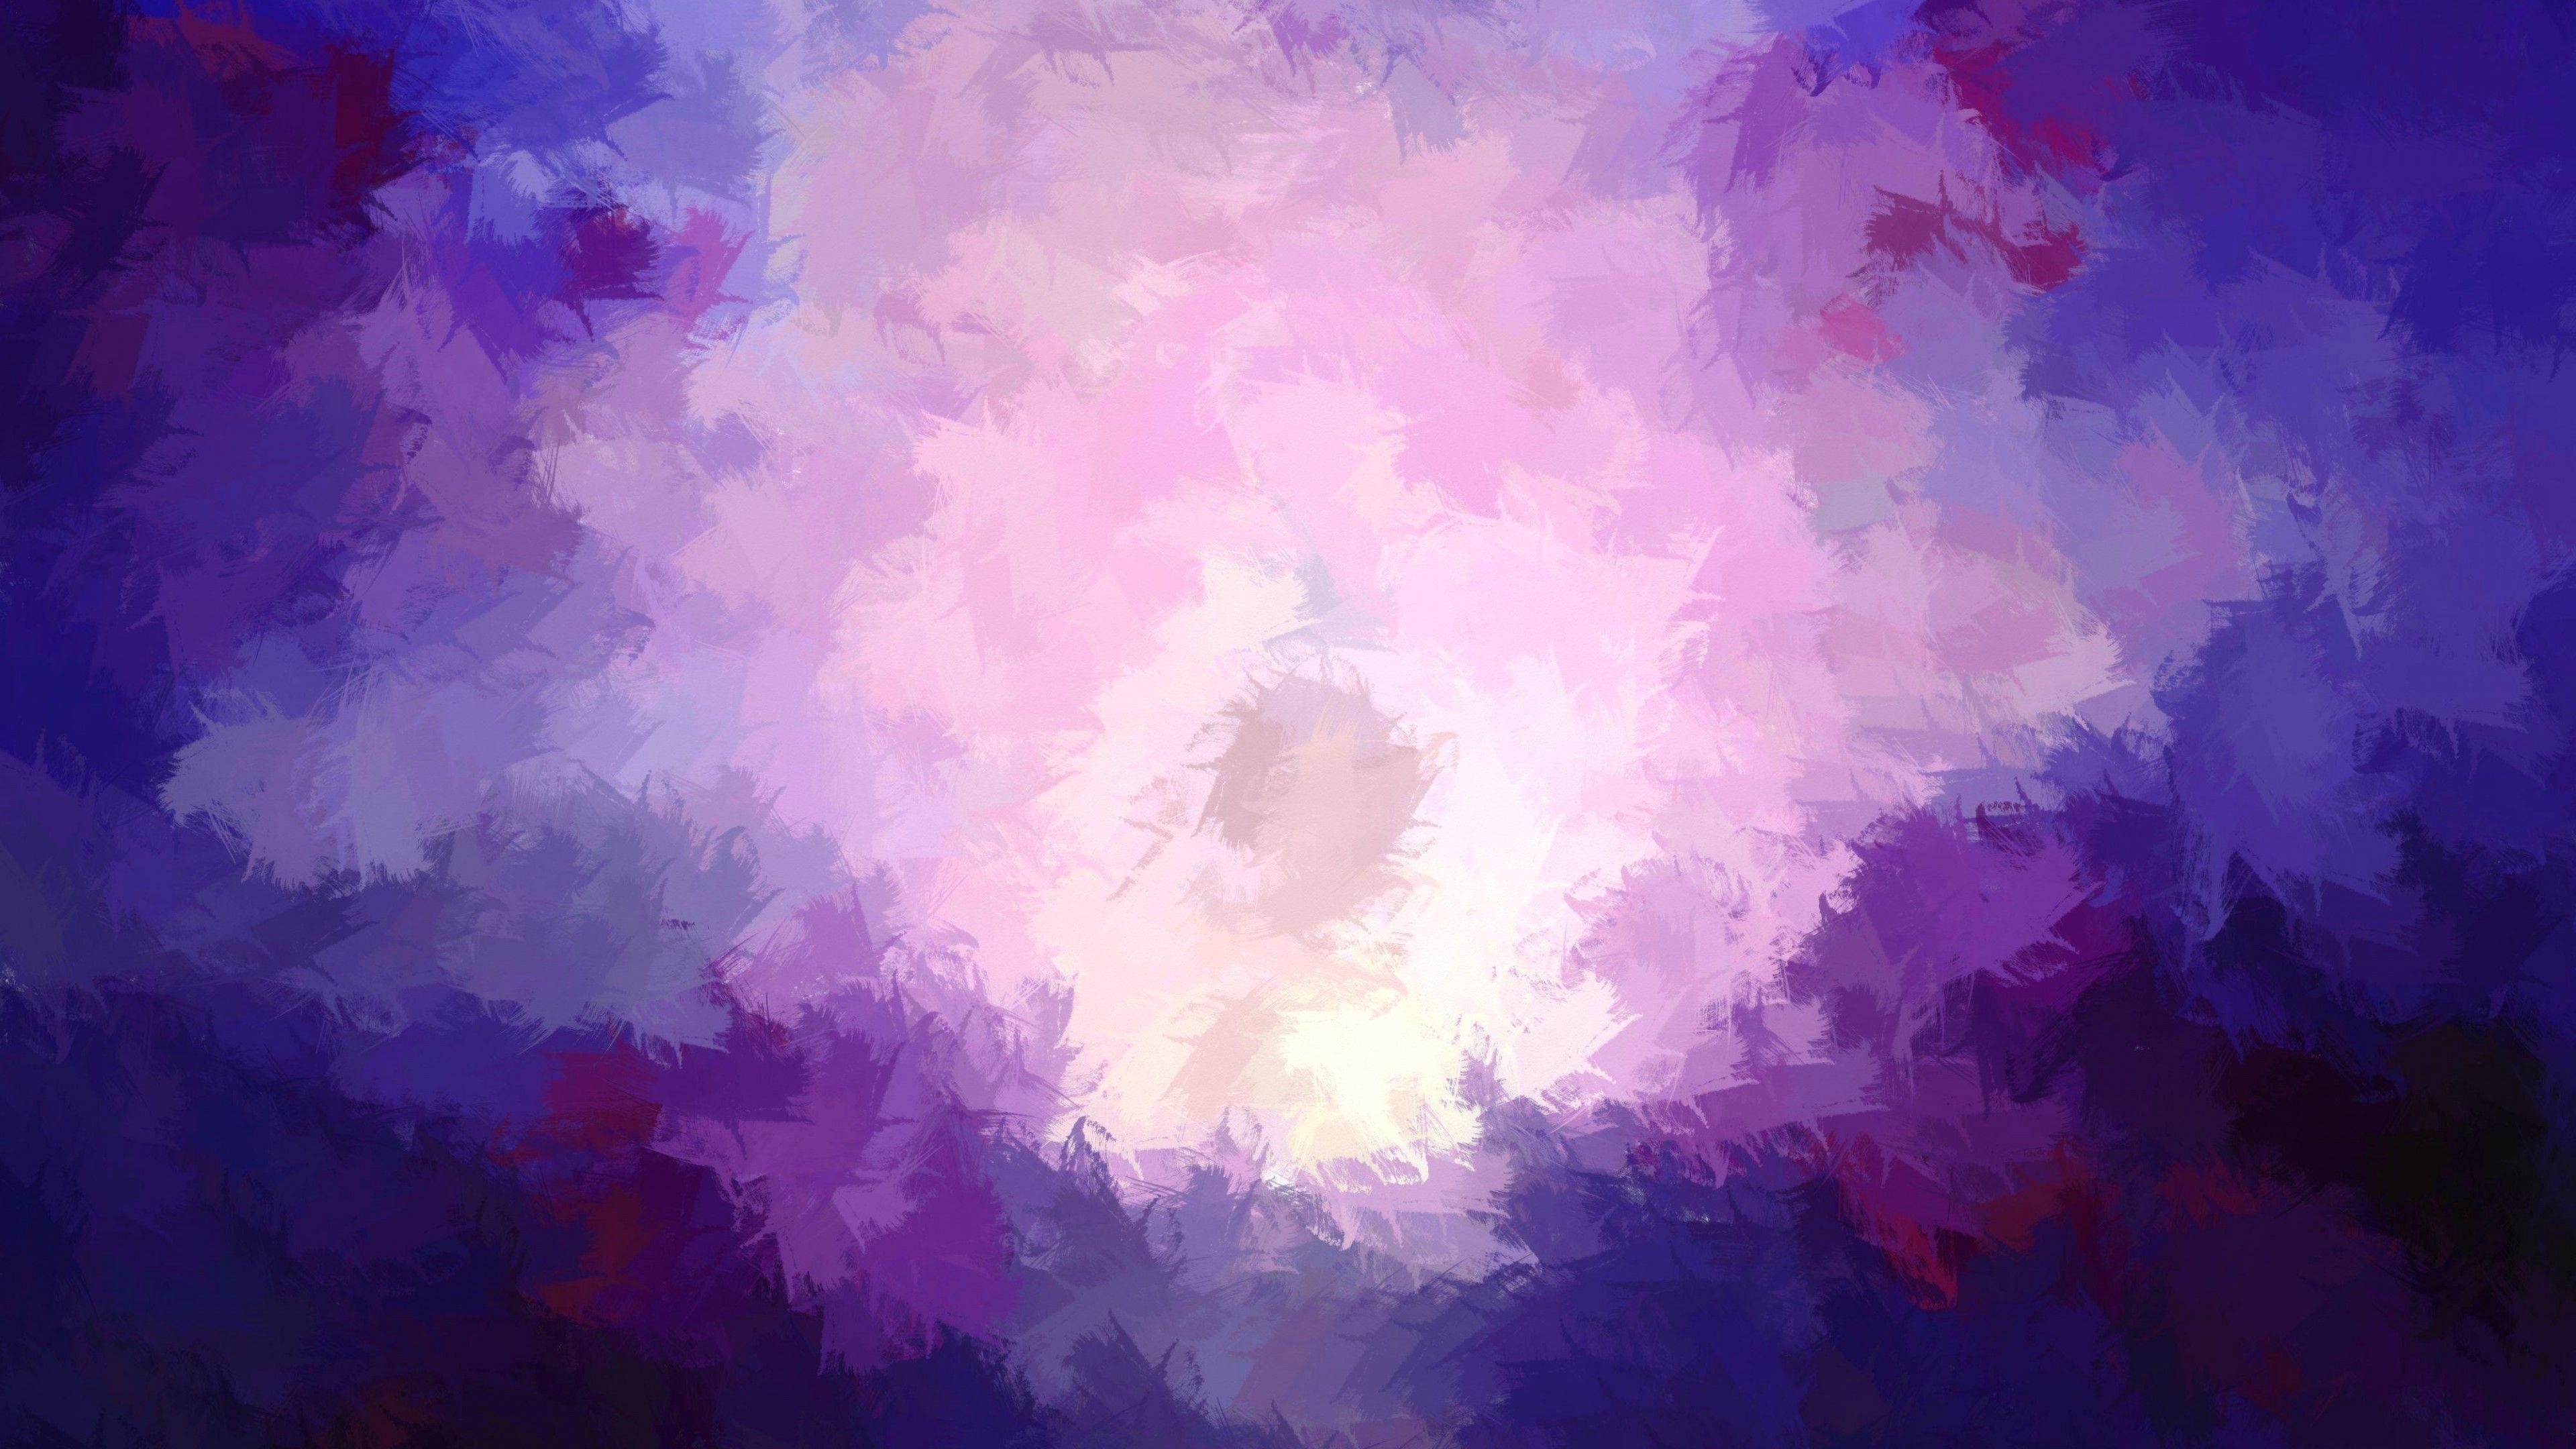 Paint Texture 4k Wallpaper Jpg 3840 2160 Paint Background